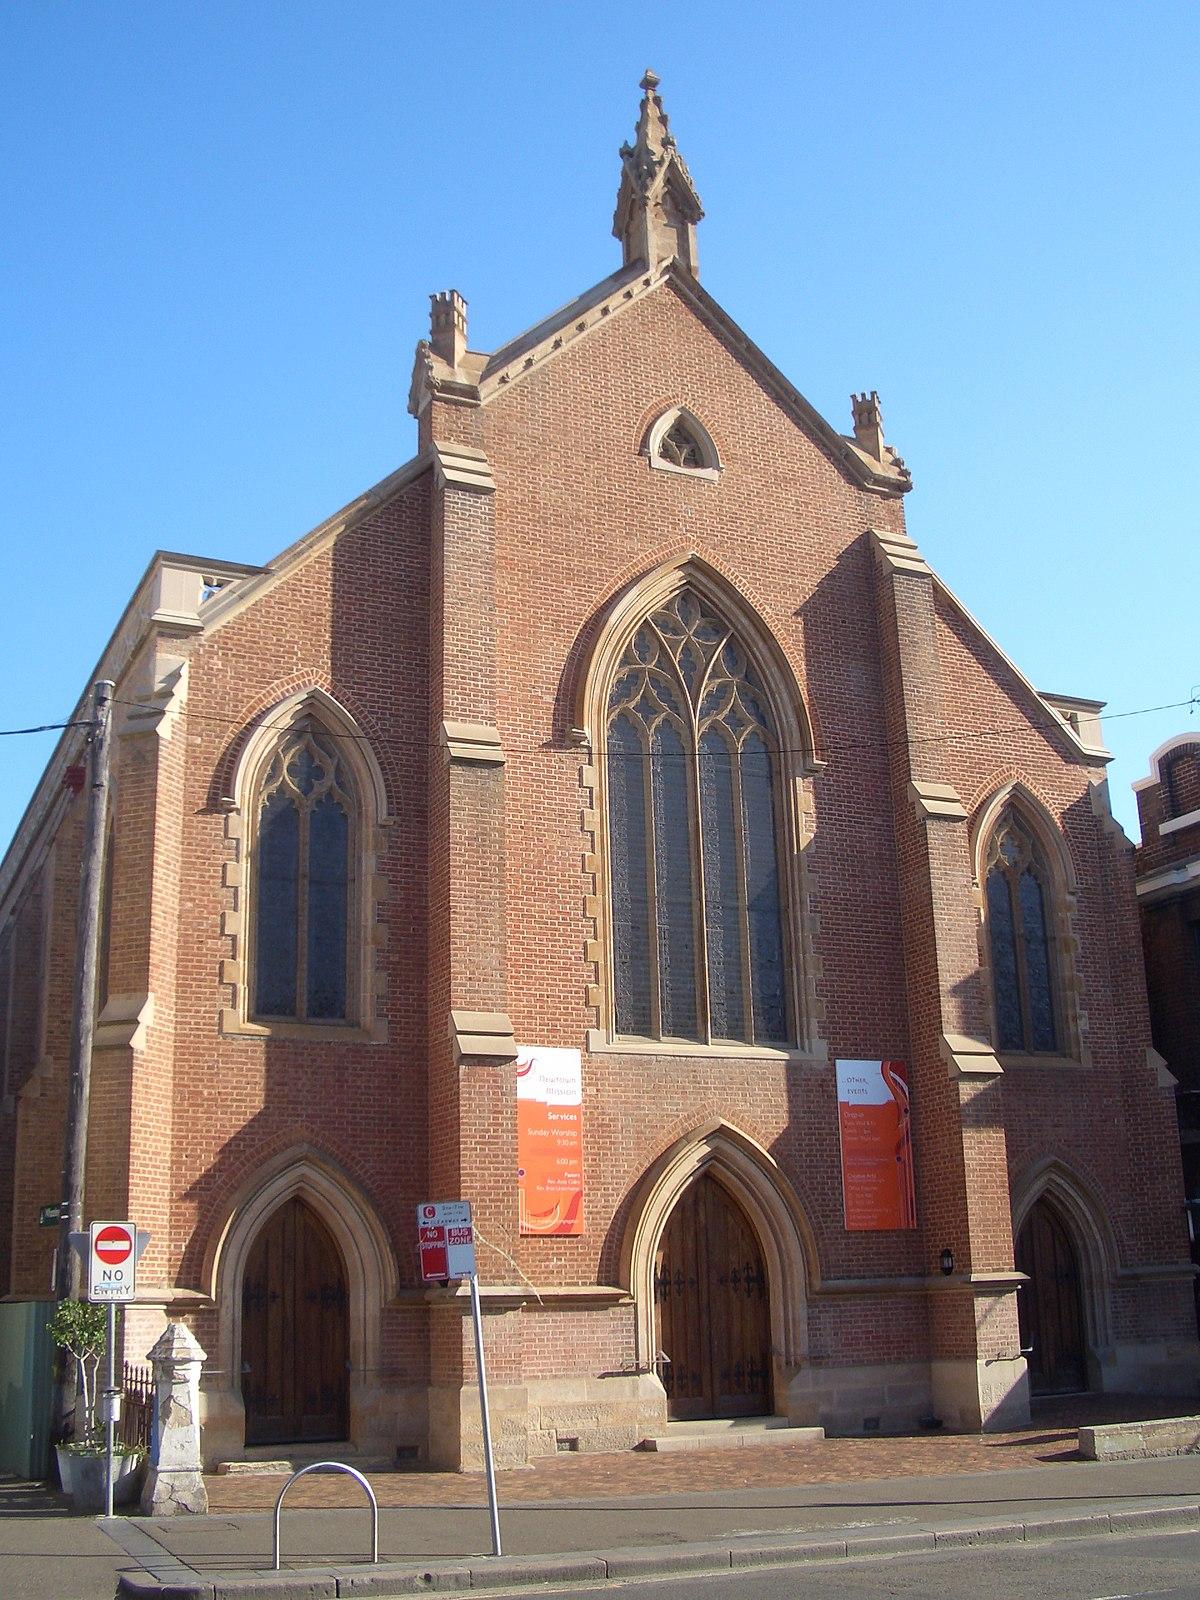 church uniting mission newtown wales south wikipedia australia sydney king street